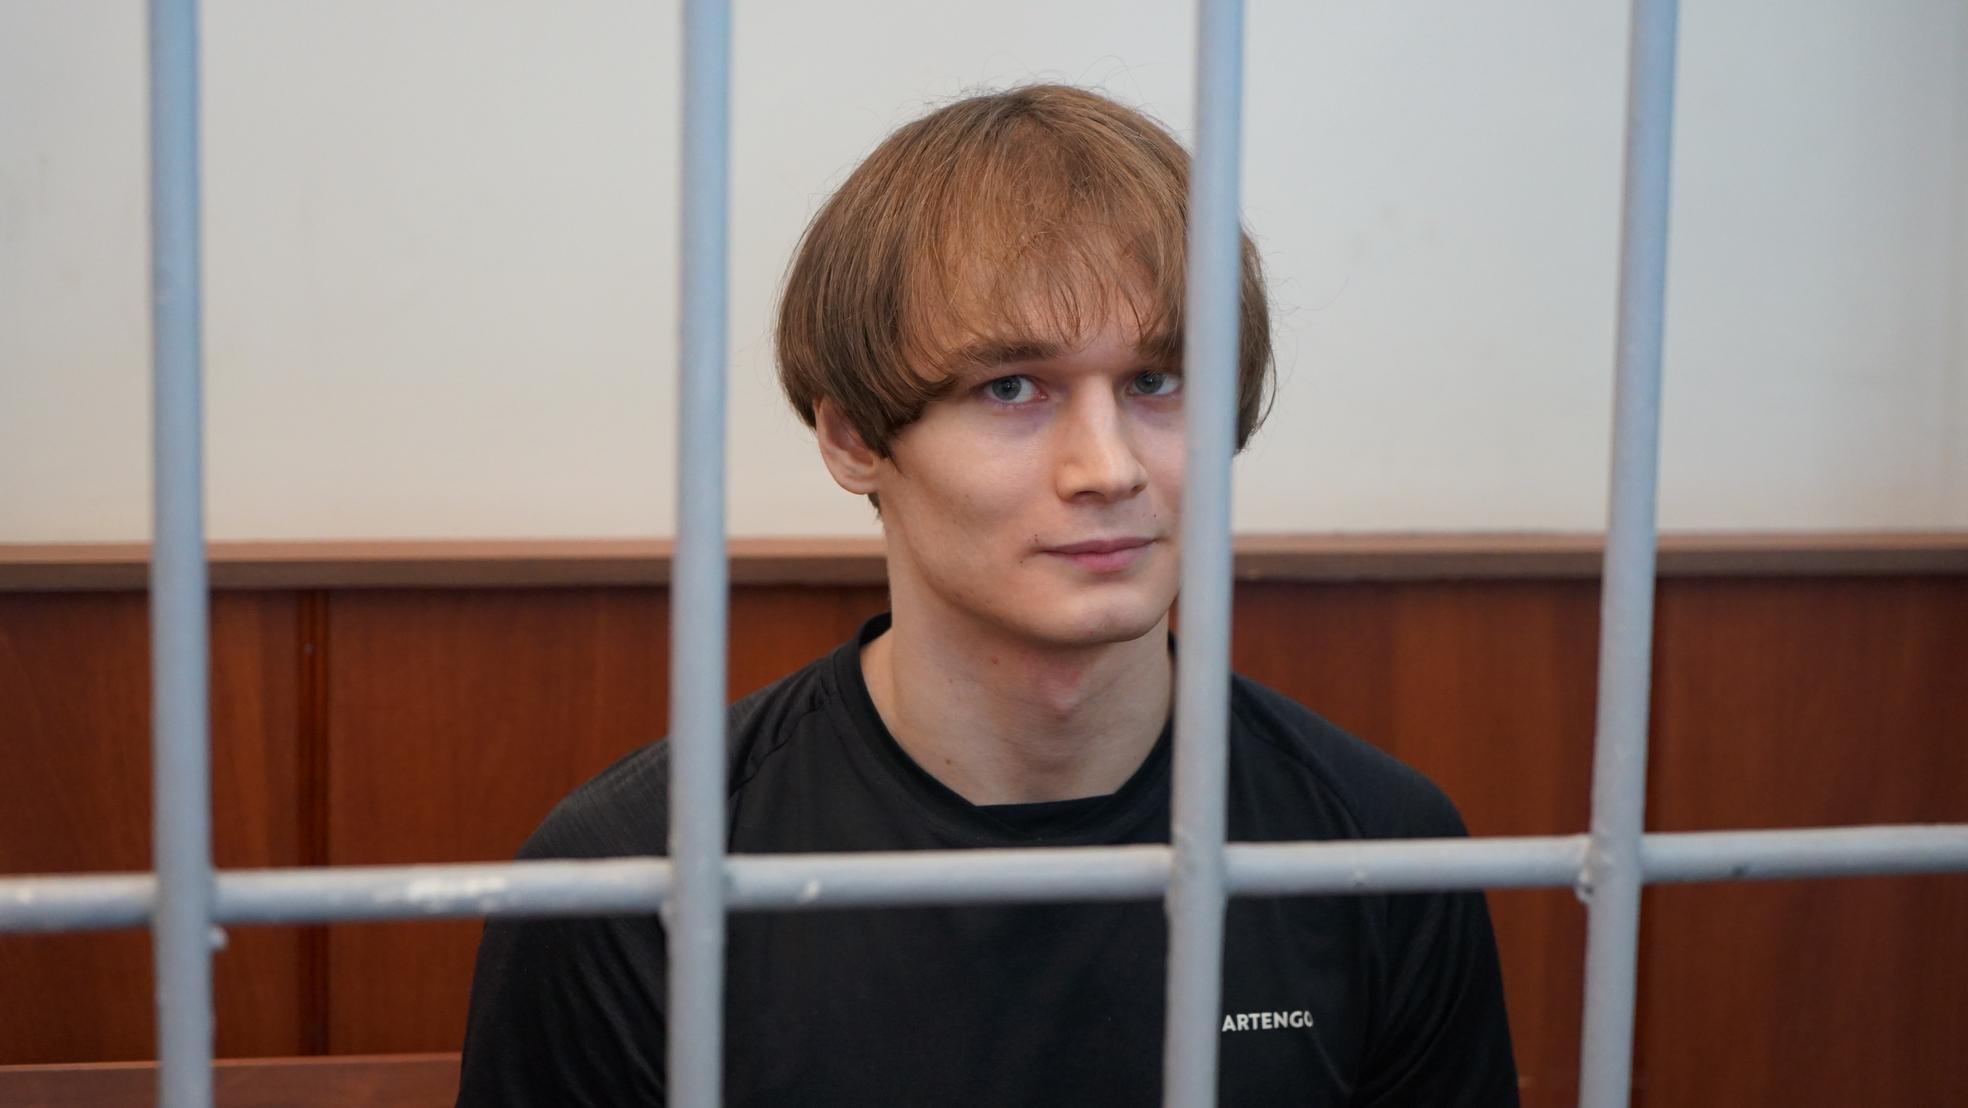 Азат Мифтахов на заседании Головинского суда. Фото Н. Деминой